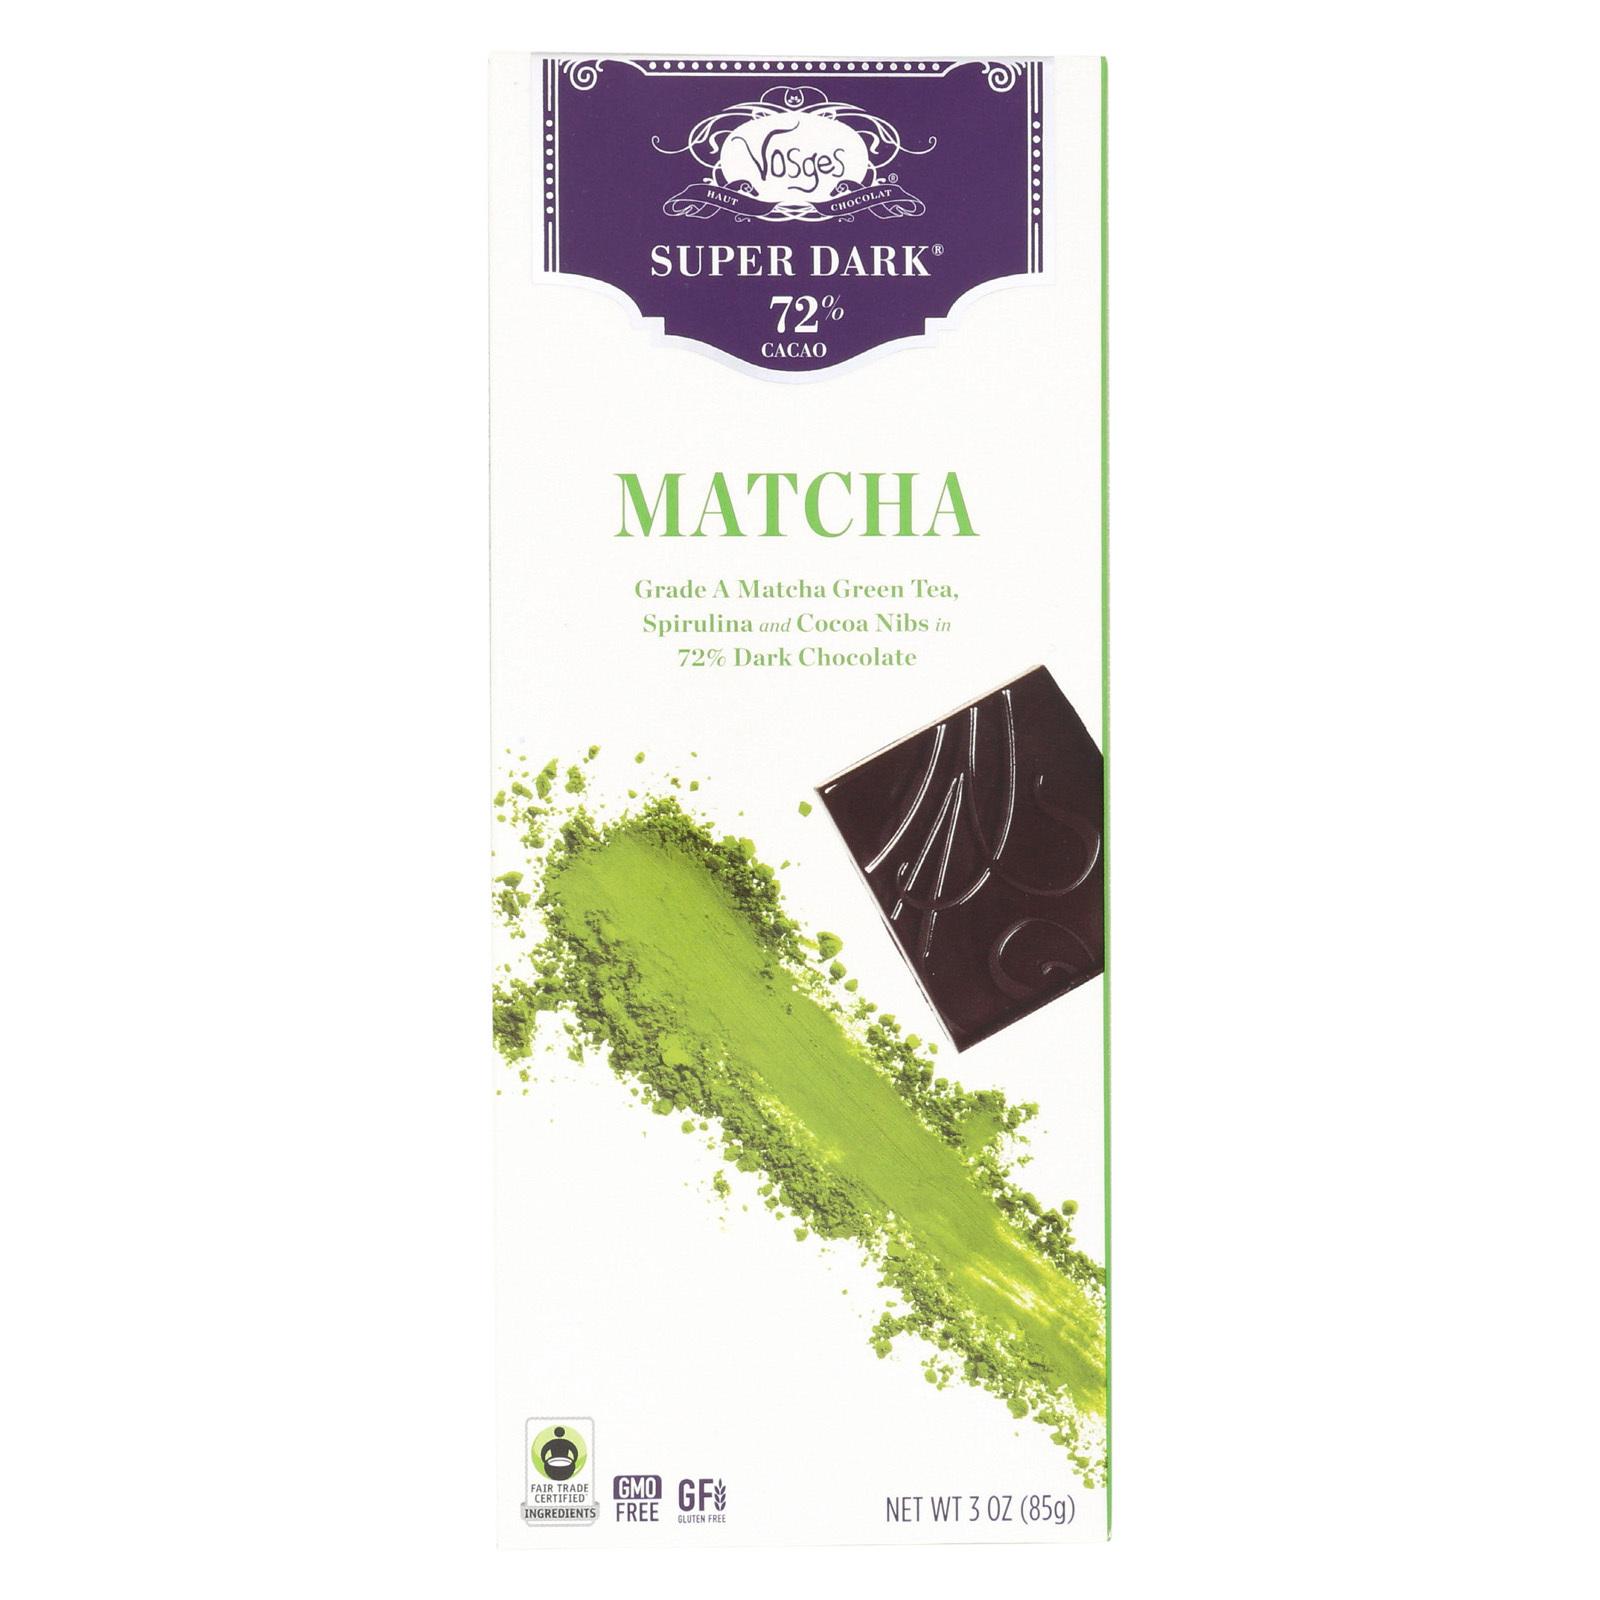 Vosges Haut-Chocolat Dark Chocolate Bar - with Spirulina and Matcha Green Tea - Case of 12 - 3 oz